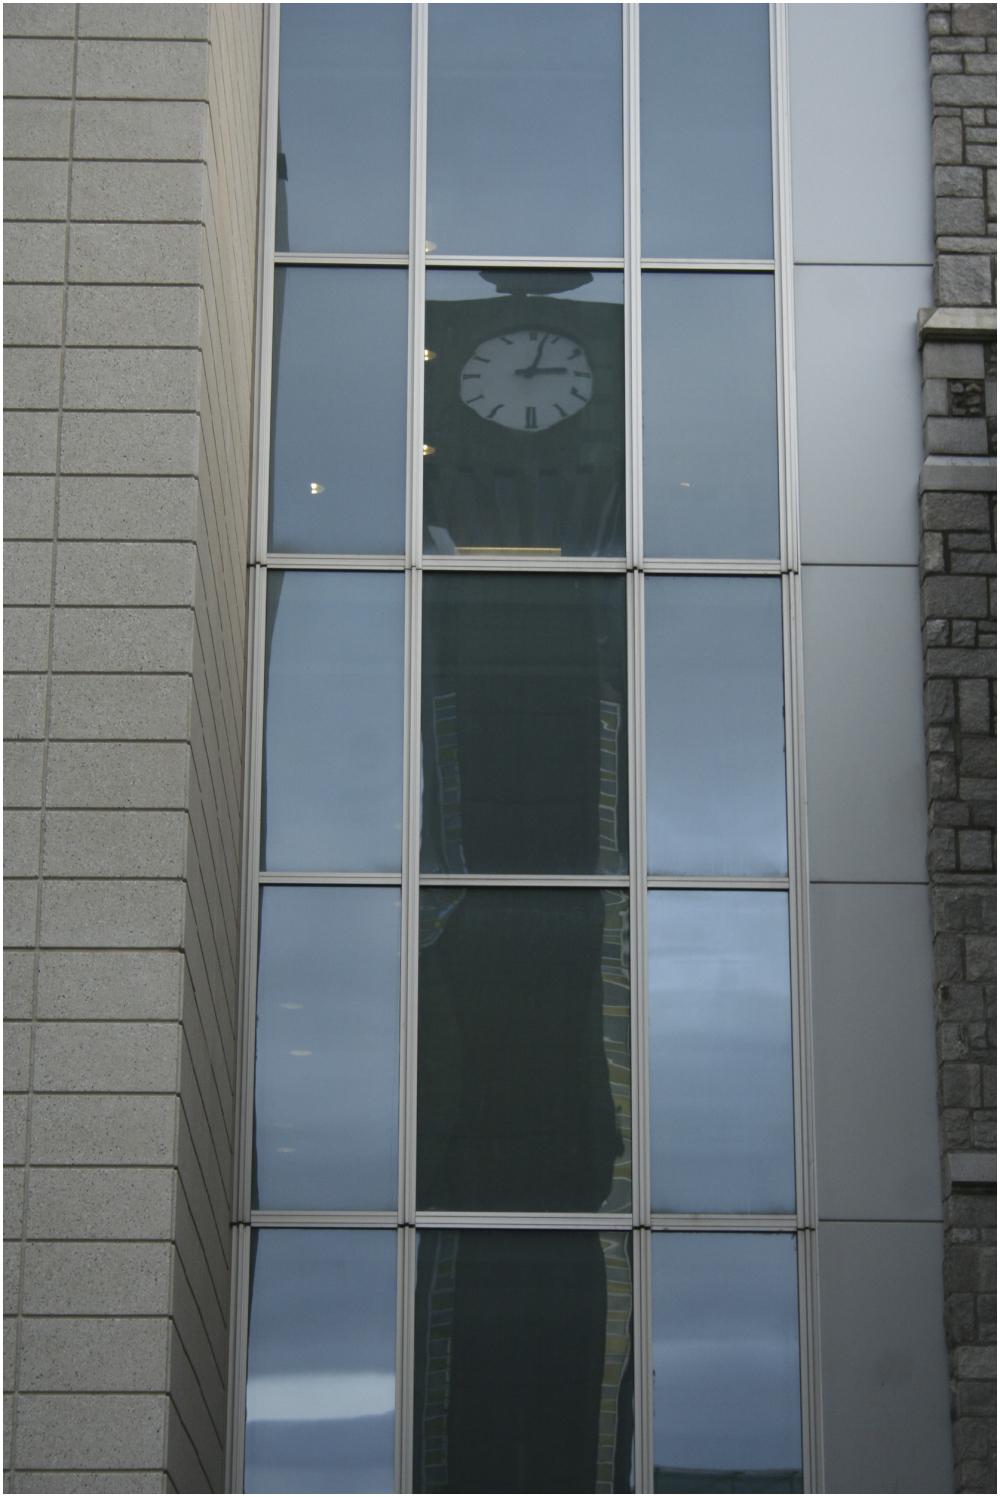 clock tower window